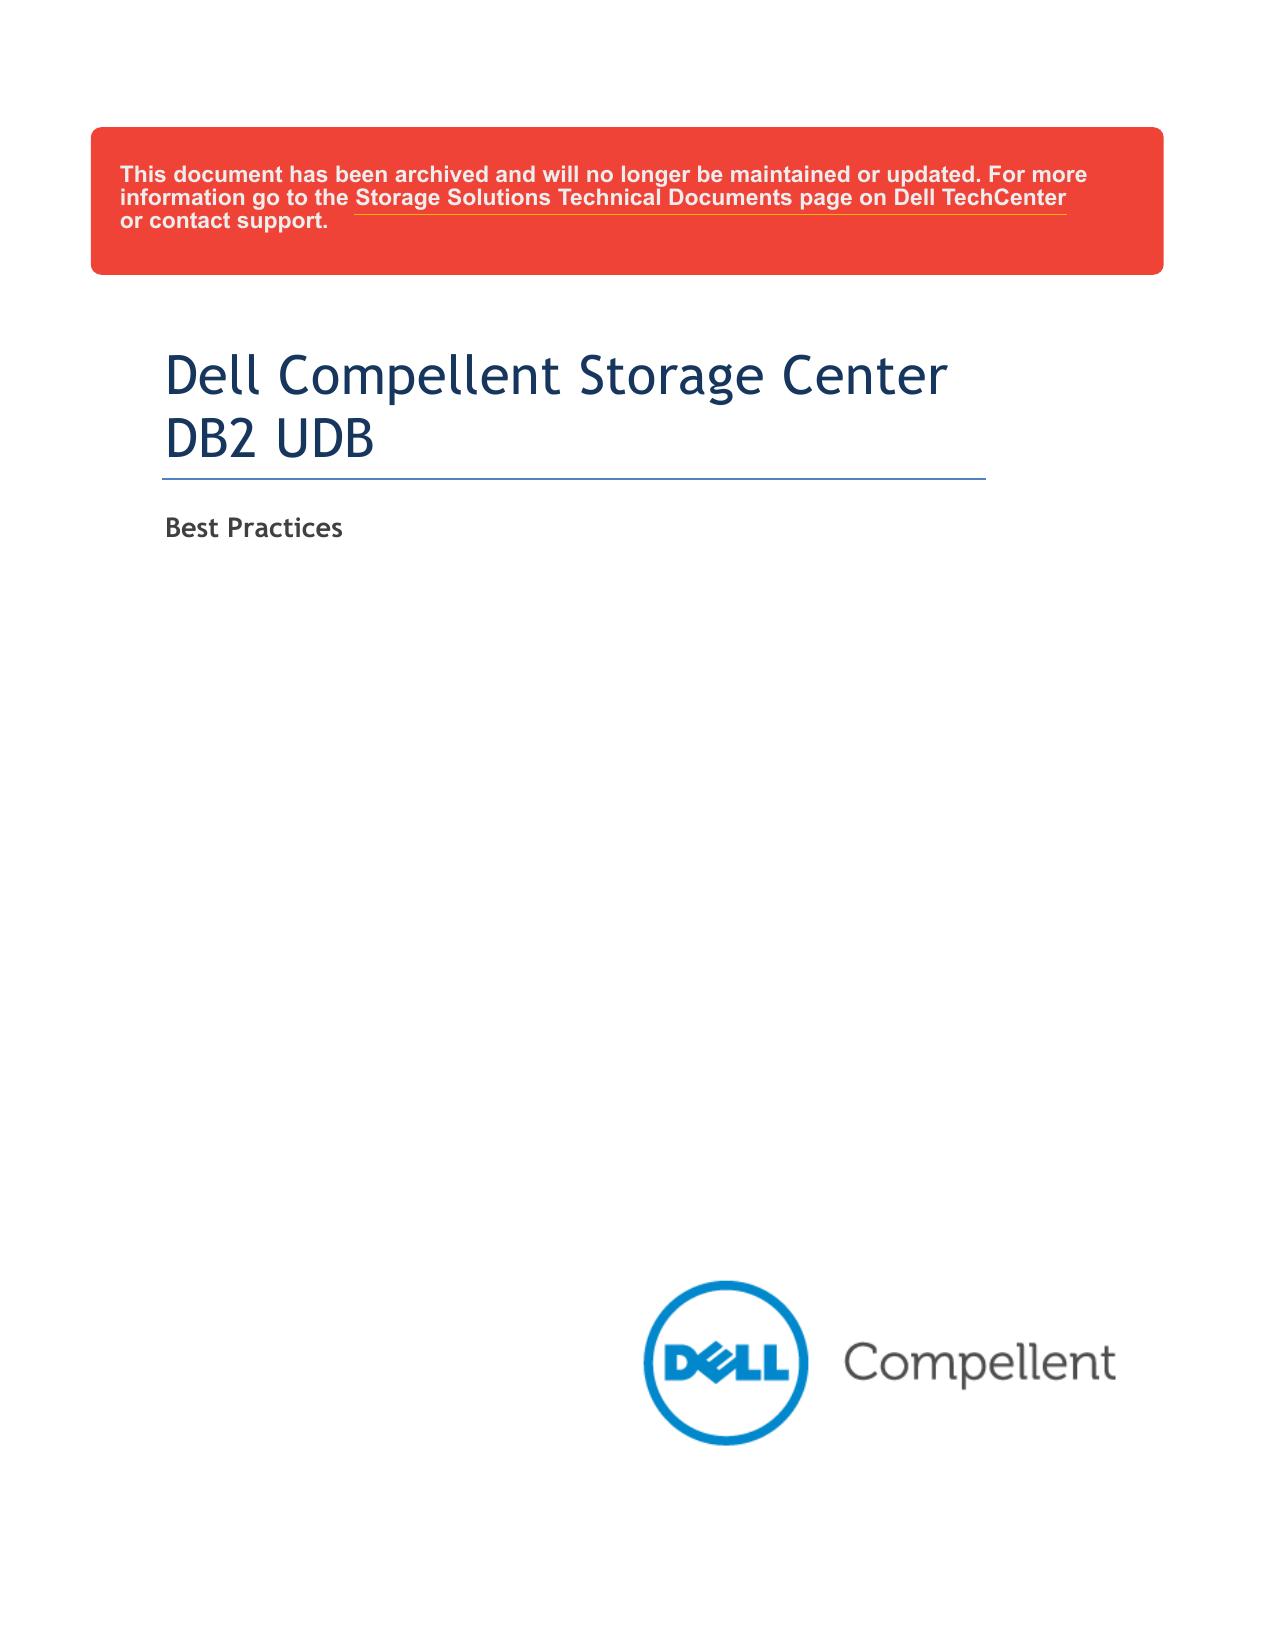 Dell Compellent Storage Center DB2 UDB | manualzz com